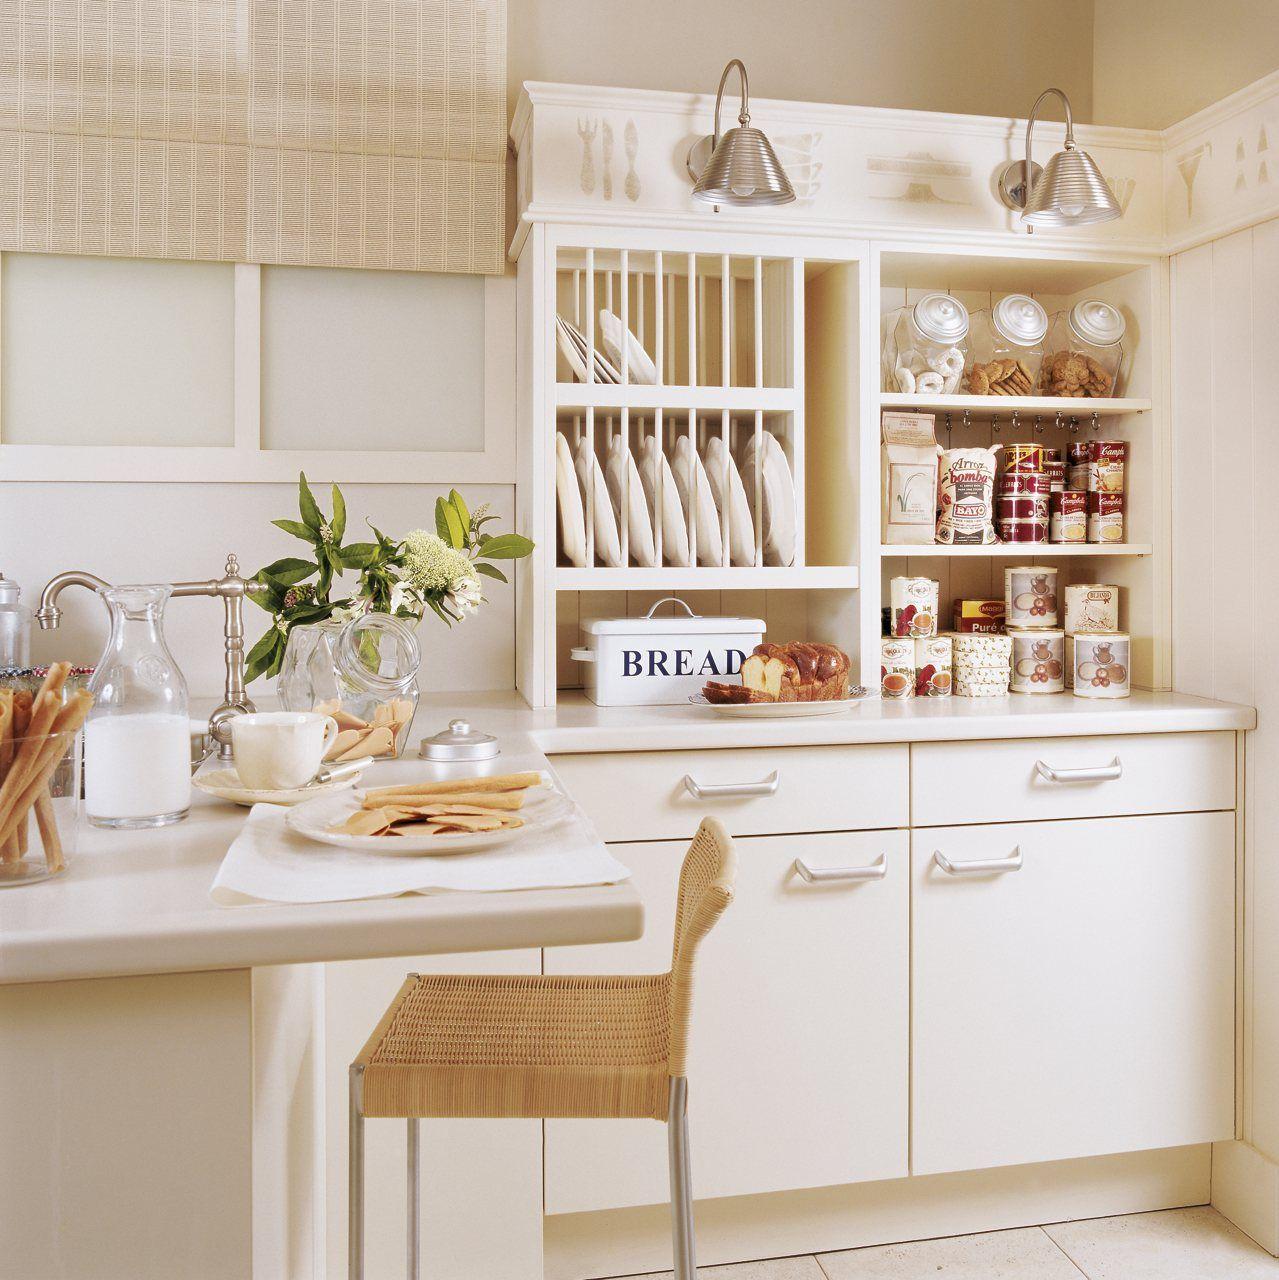 Ideas para iluminar cada zona de la cocina lamparas sevilla - Apliques de cocina ...